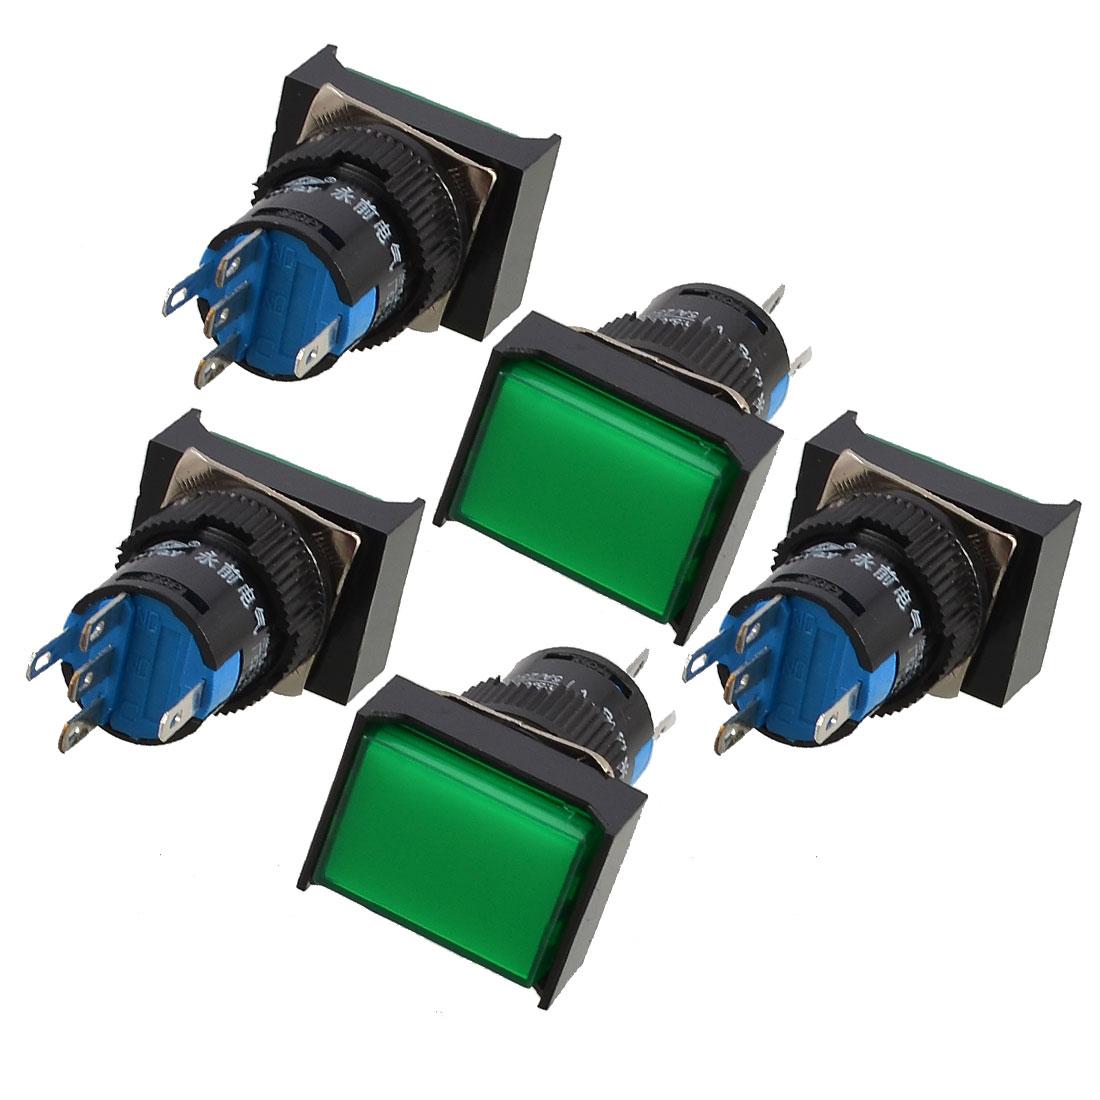 5pcs-AC-220V-Light-1P2T-Green-Rectangle-Cap-Momentary-Push-Button-Switch